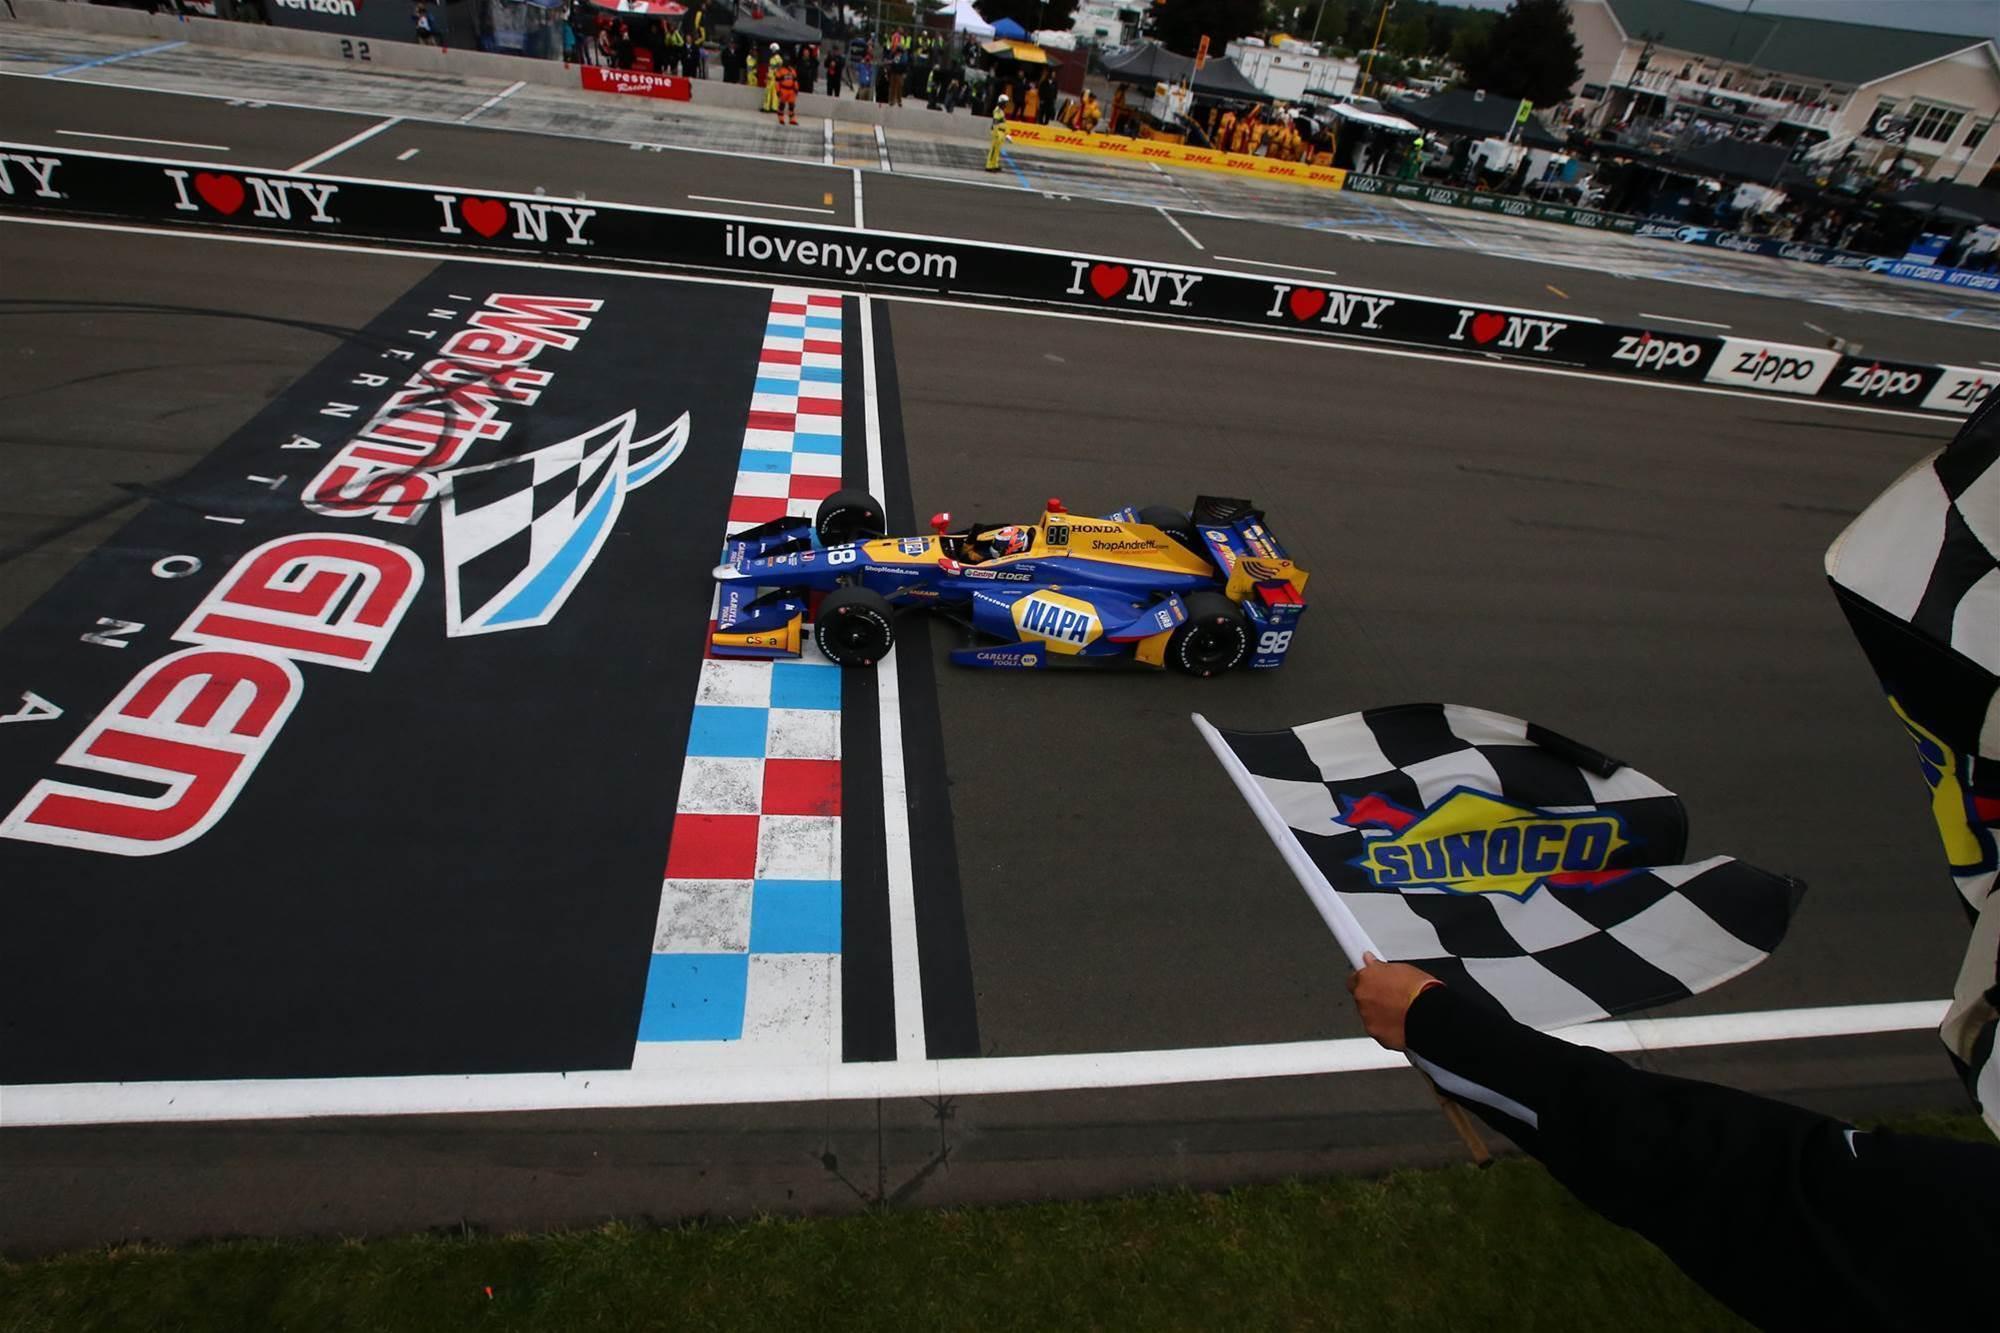 Pic gallery: Watkins Glen Indycars